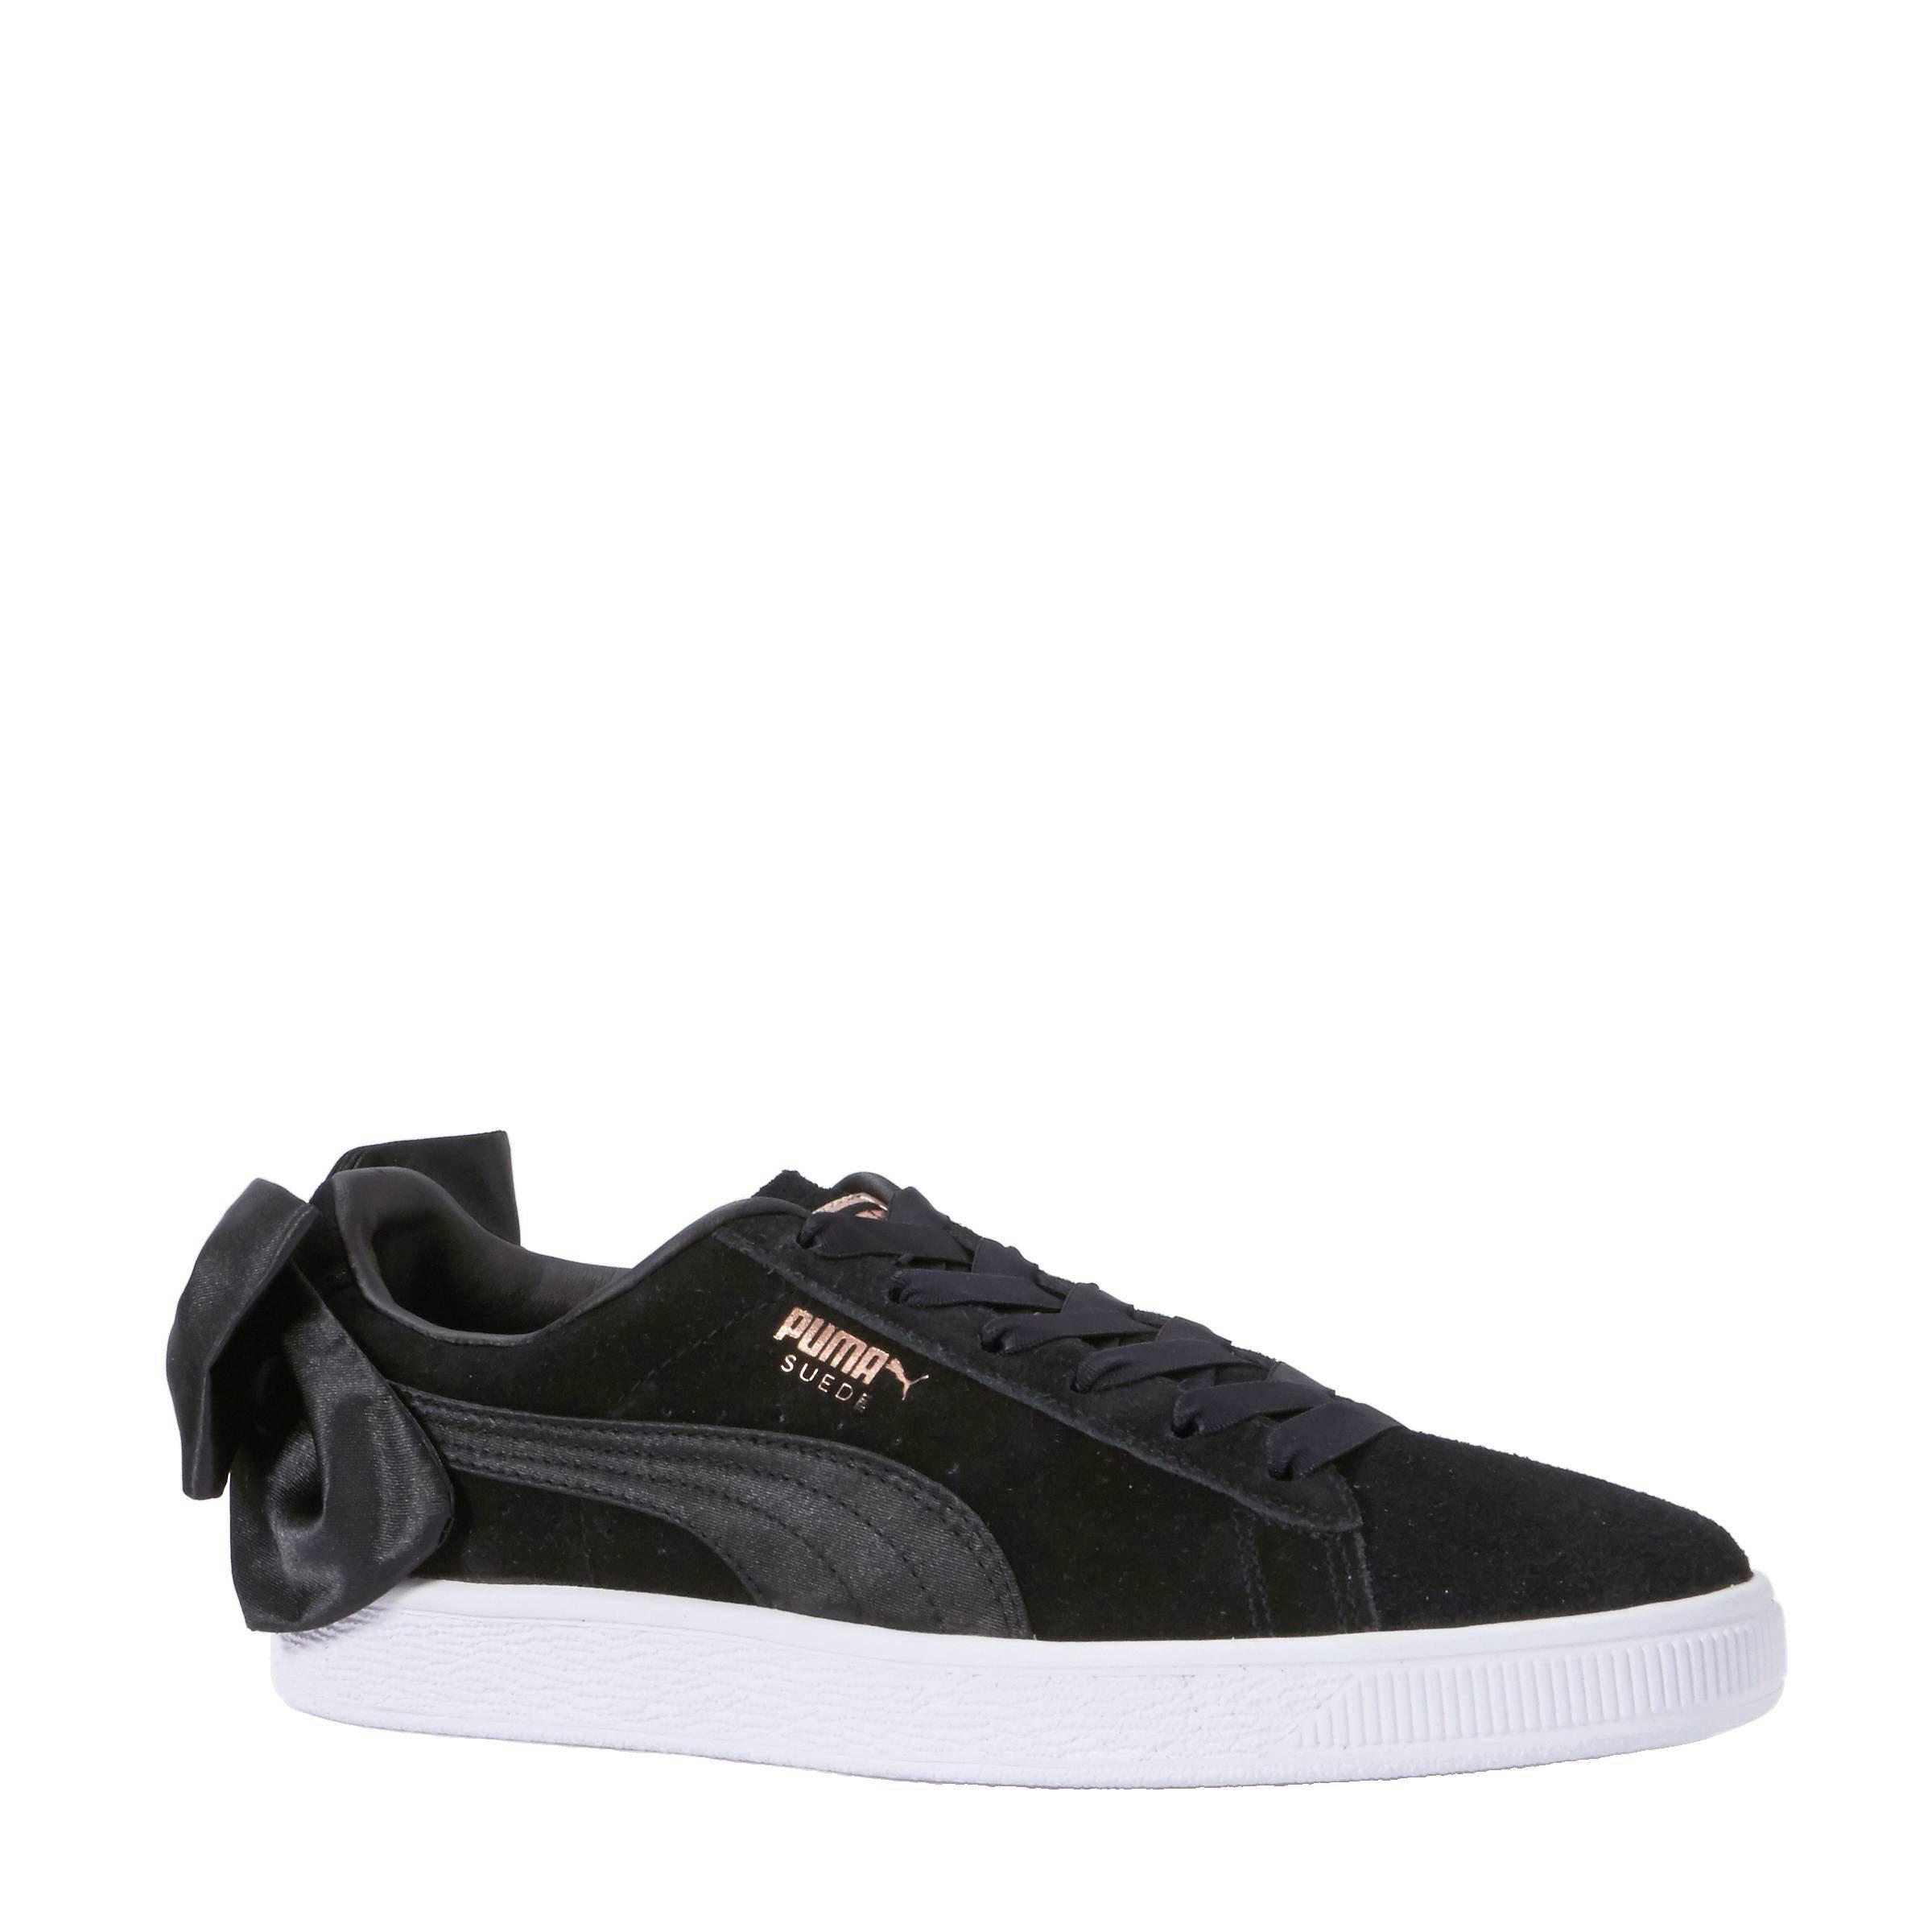 Puma Suède Bow sneakers (dames)